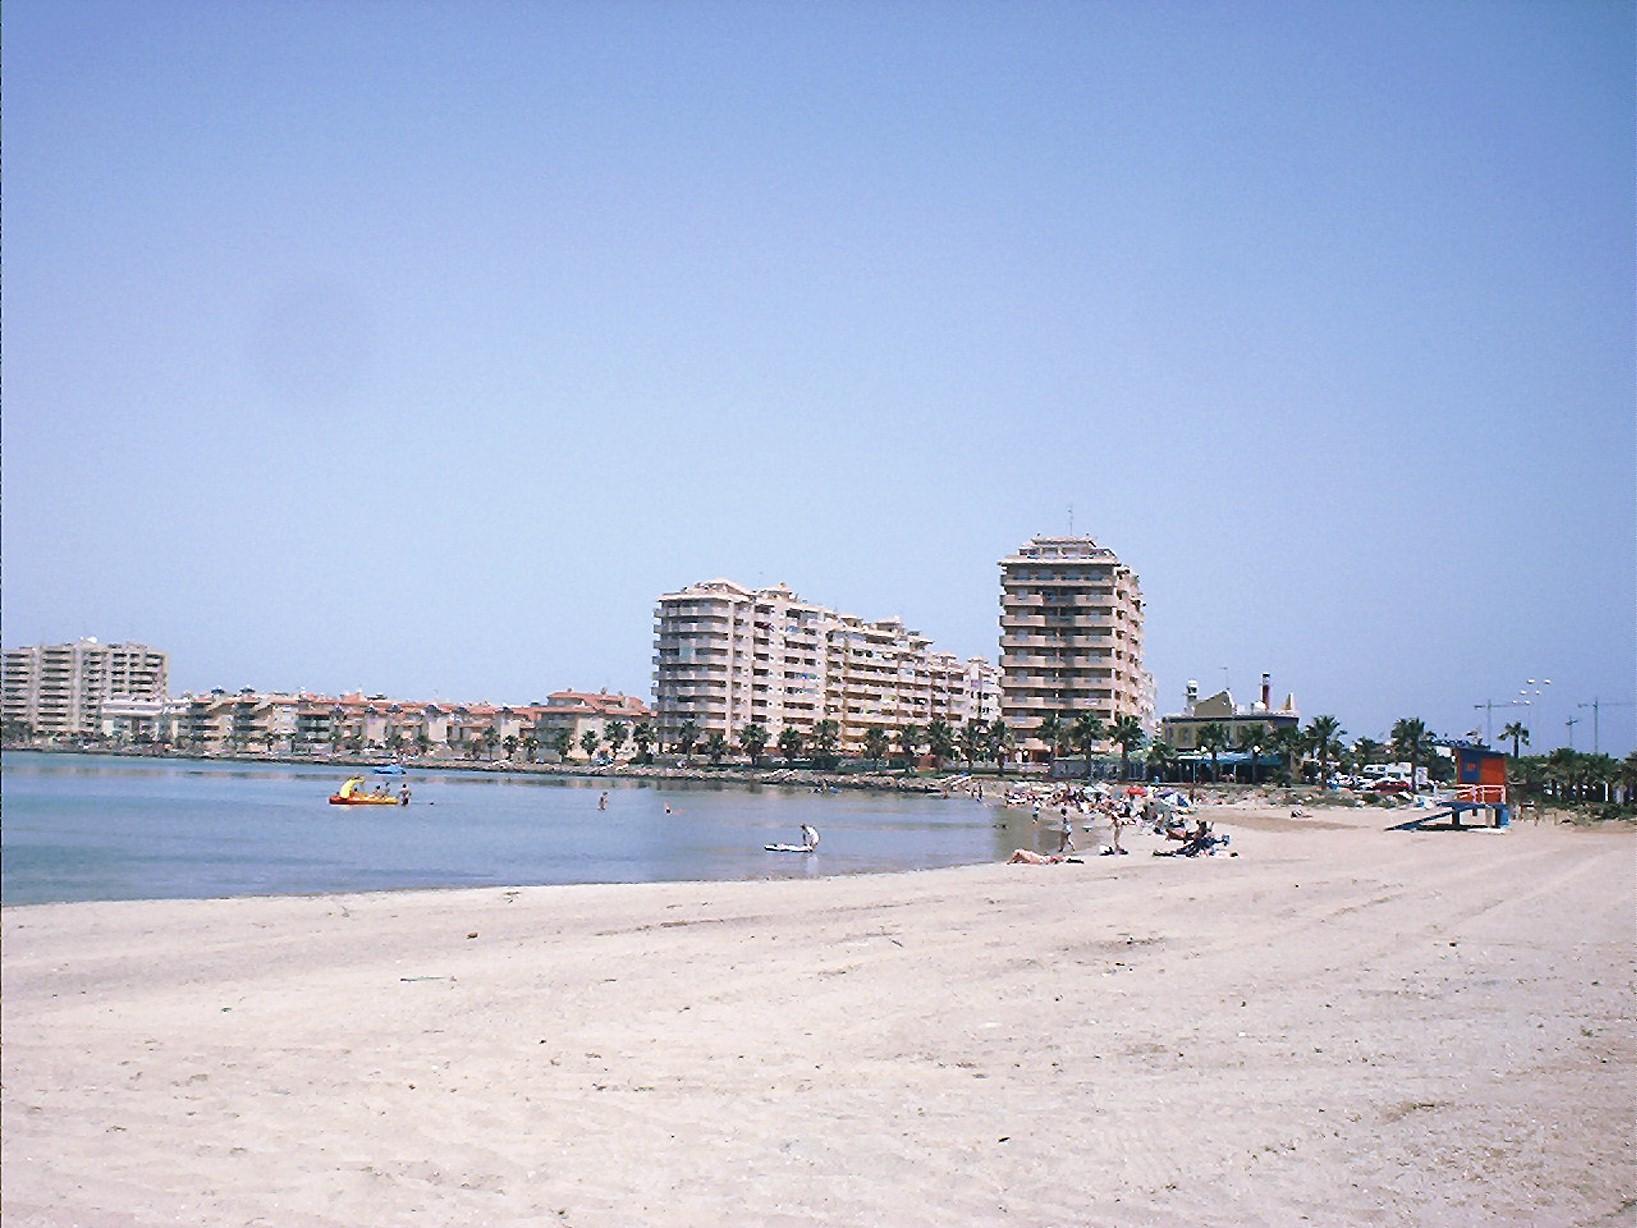 strand Aalbæk Strand